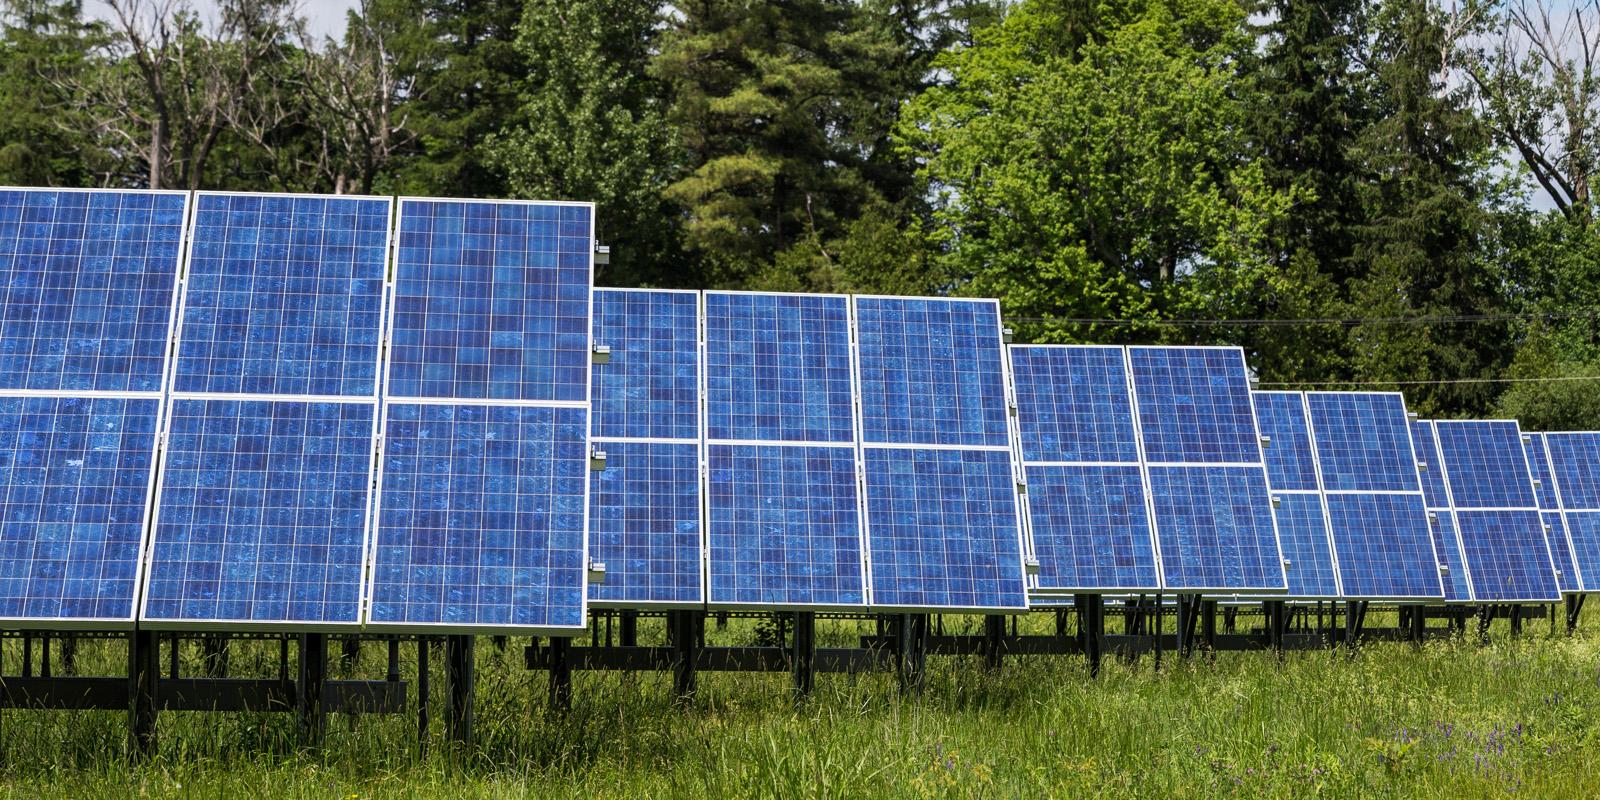 Guarding Solar Arrays